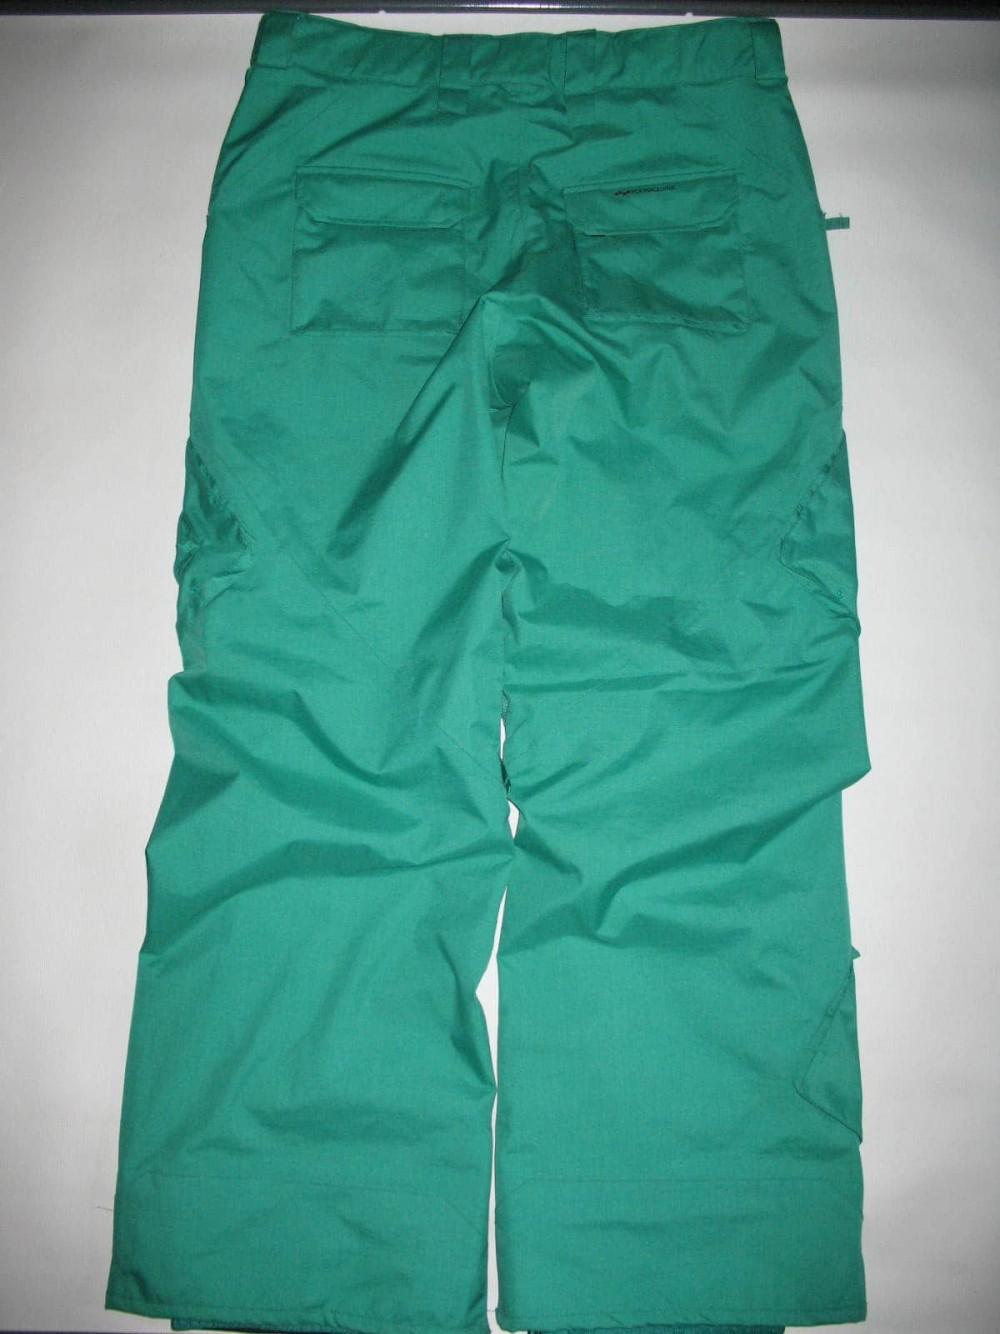 Штаны FOURSQUARE q snowboard pants (размер XL) - 2